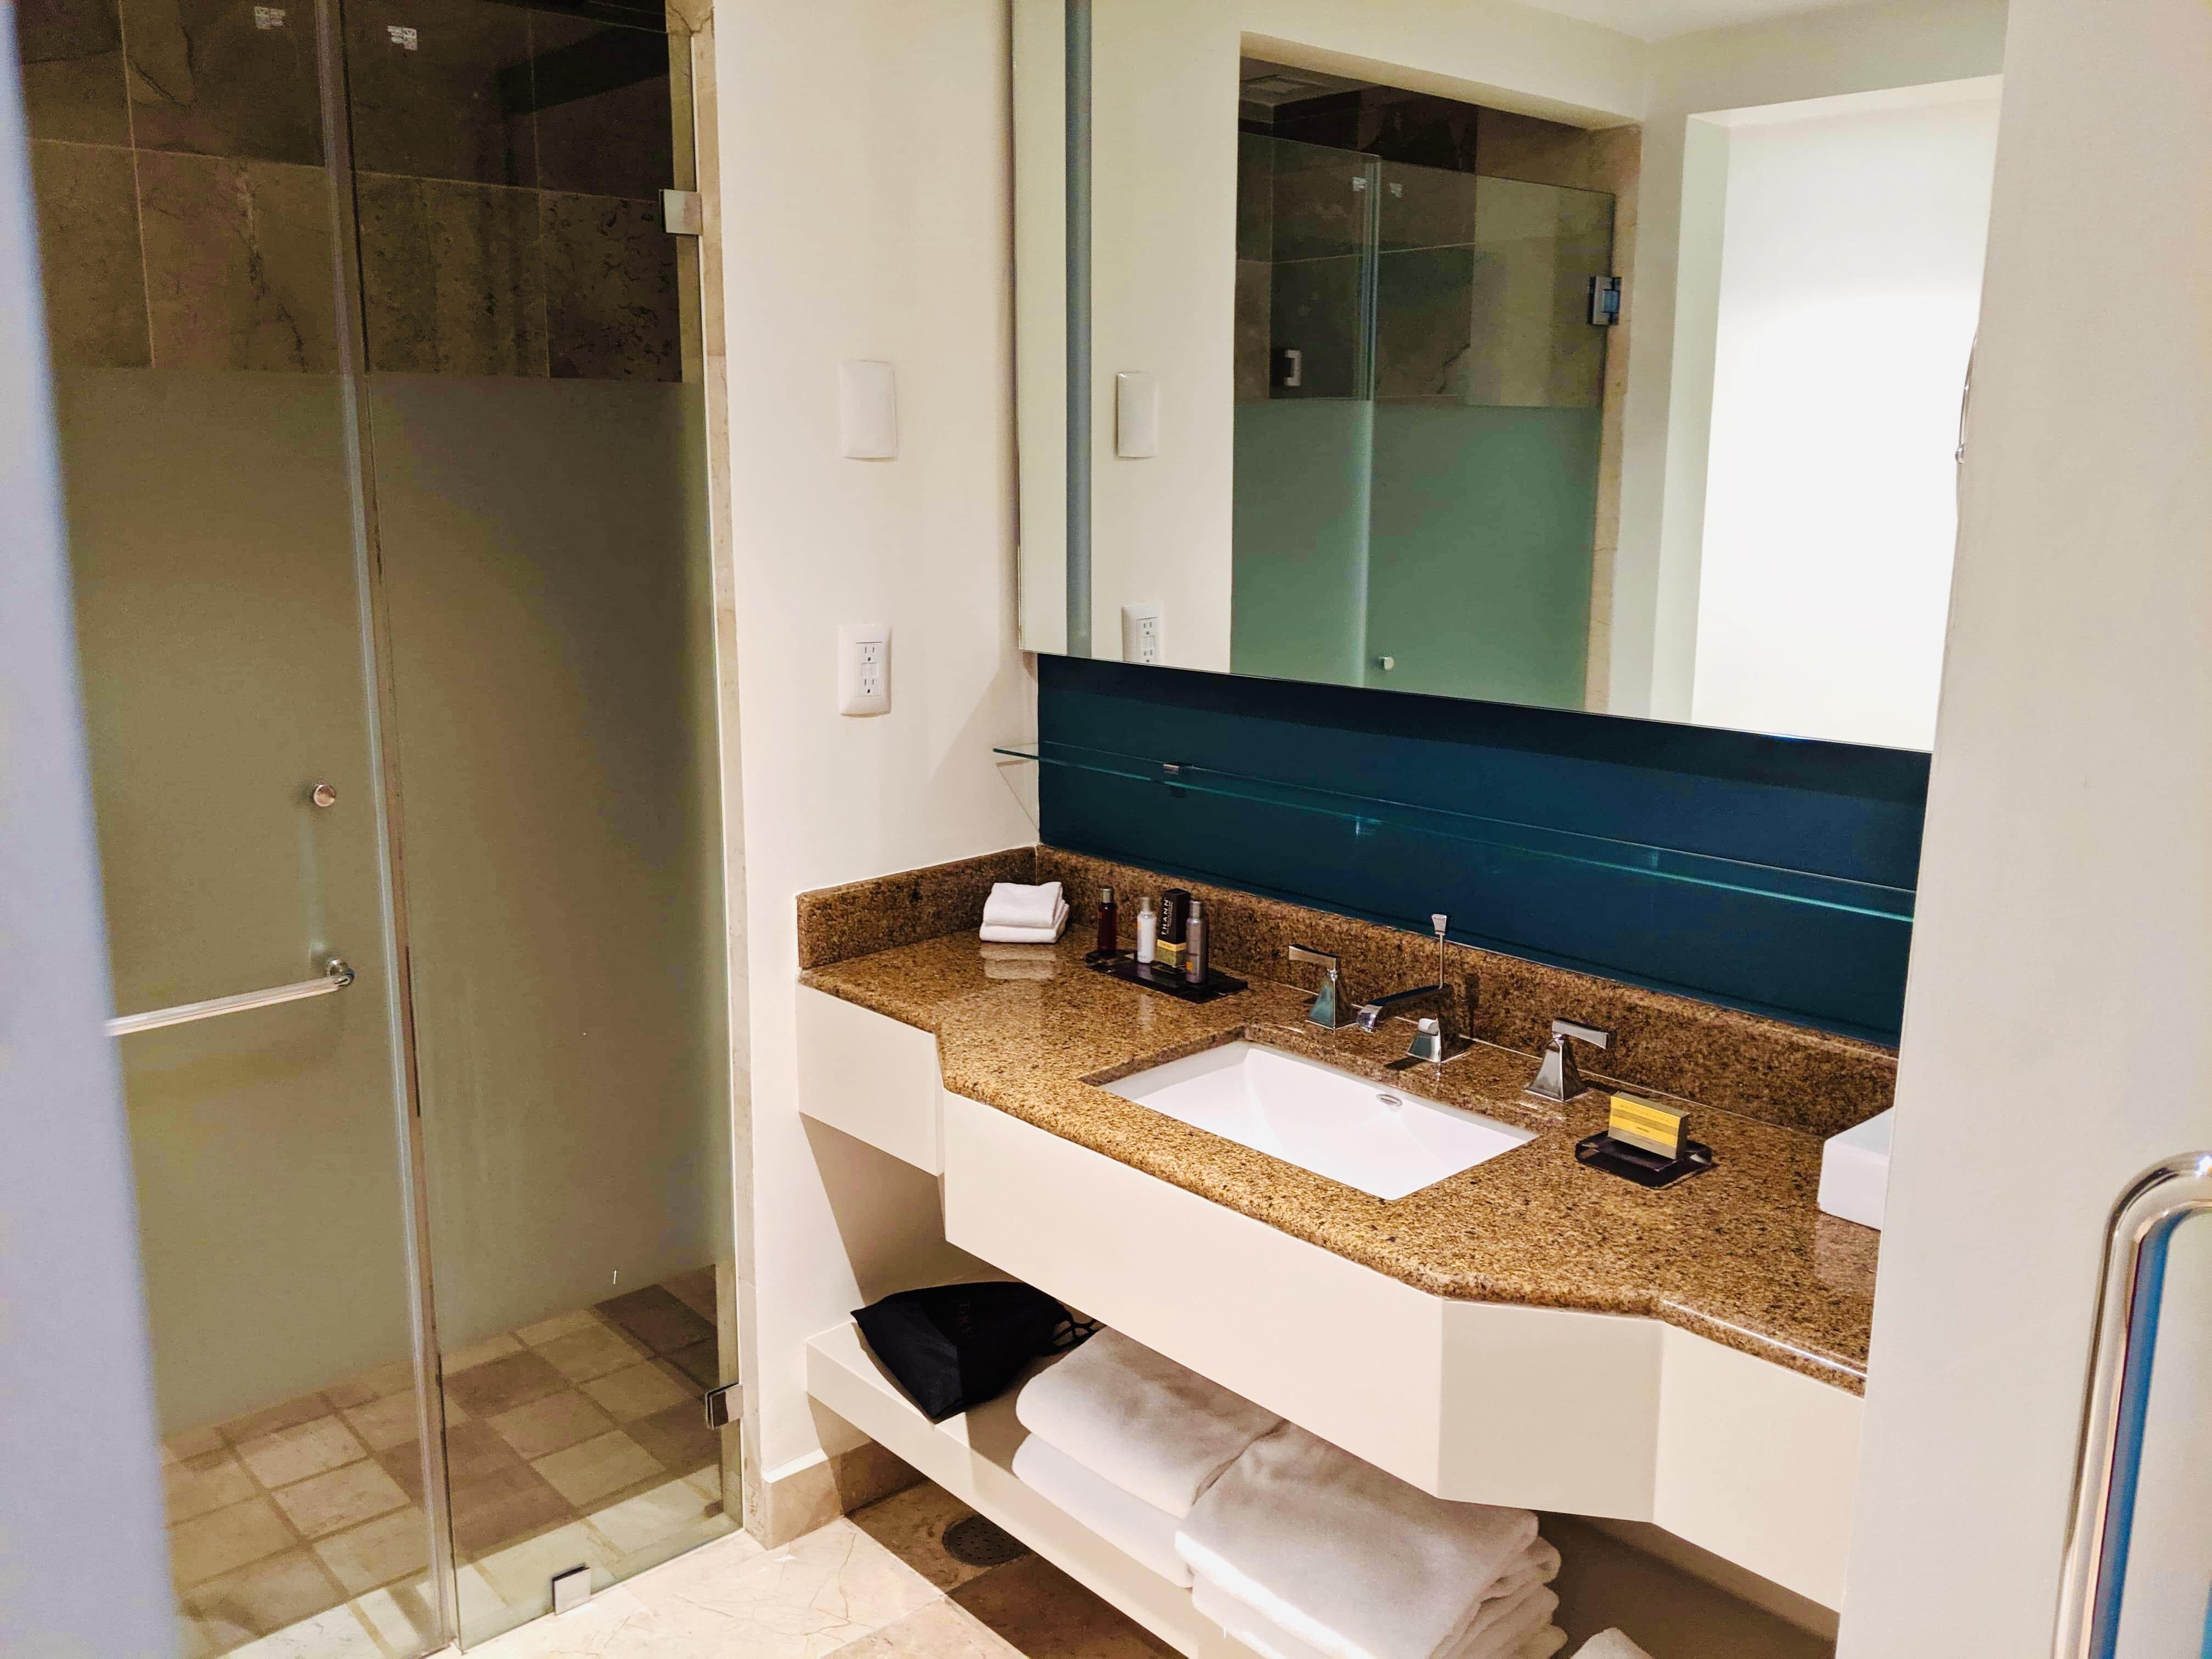 Marriott hotel bathroom sink